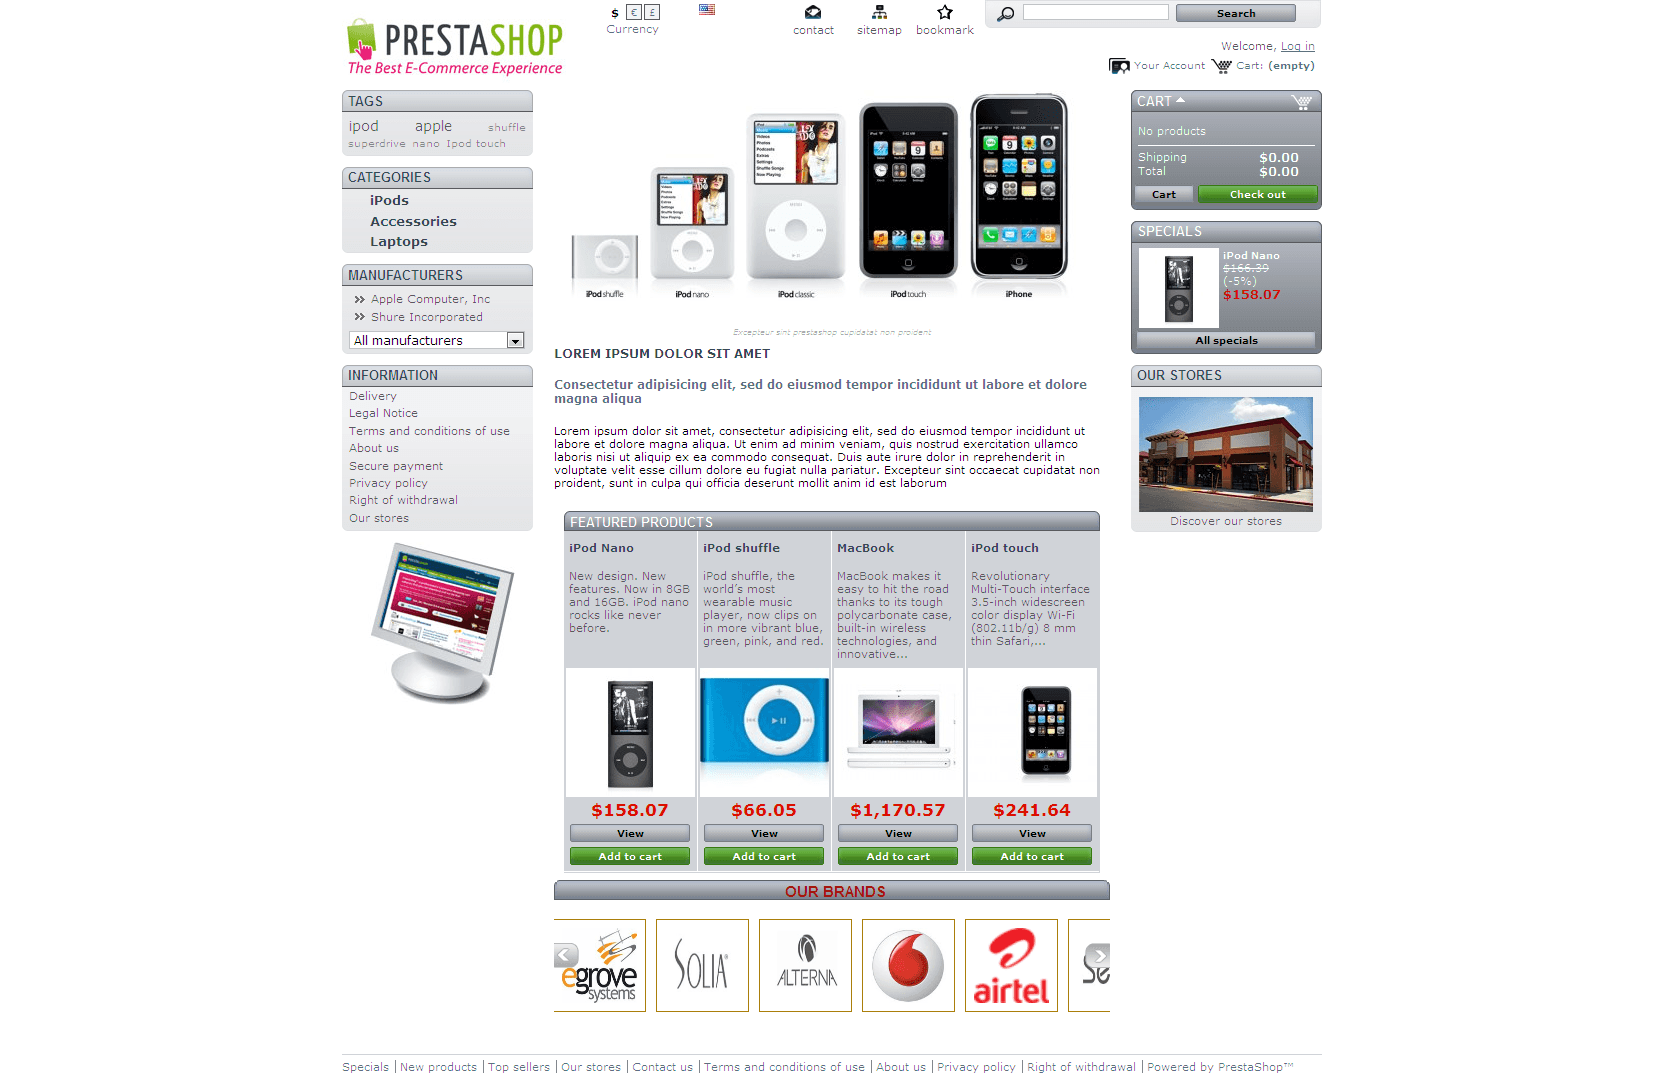 Prestashop Brand Display